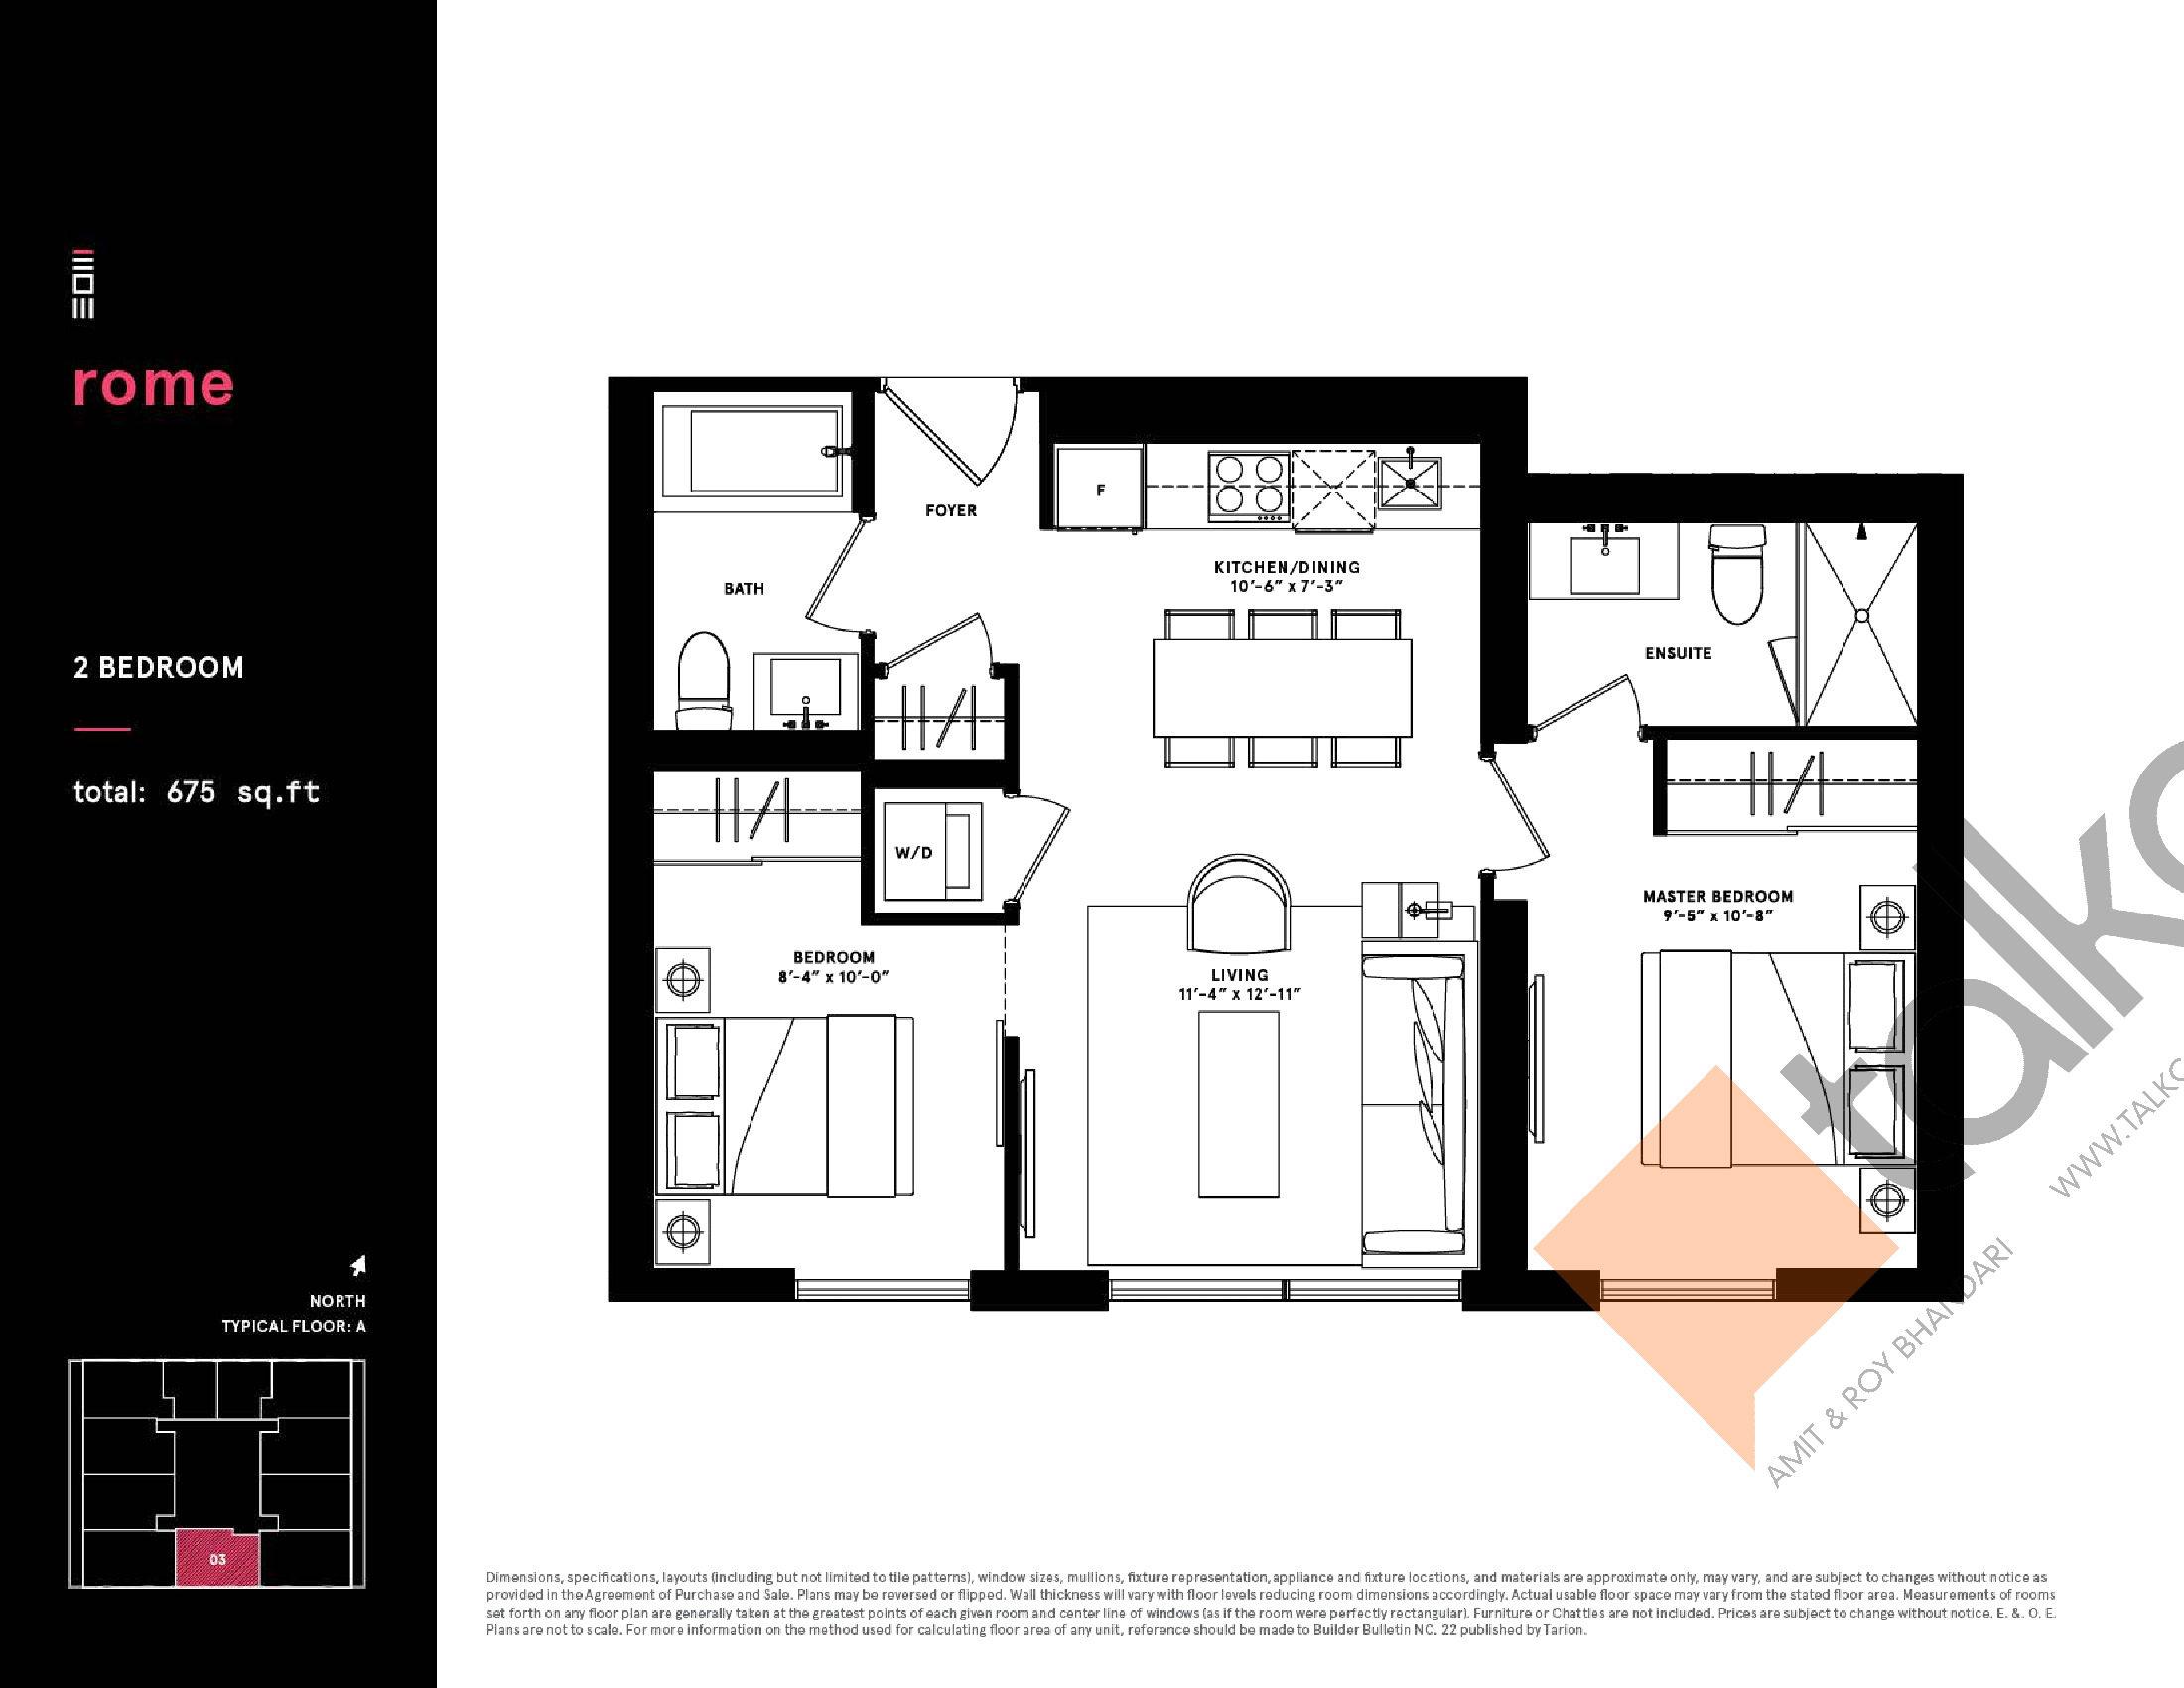 Rome Floor Plan at Exchange District Condos - 675 sq.ft